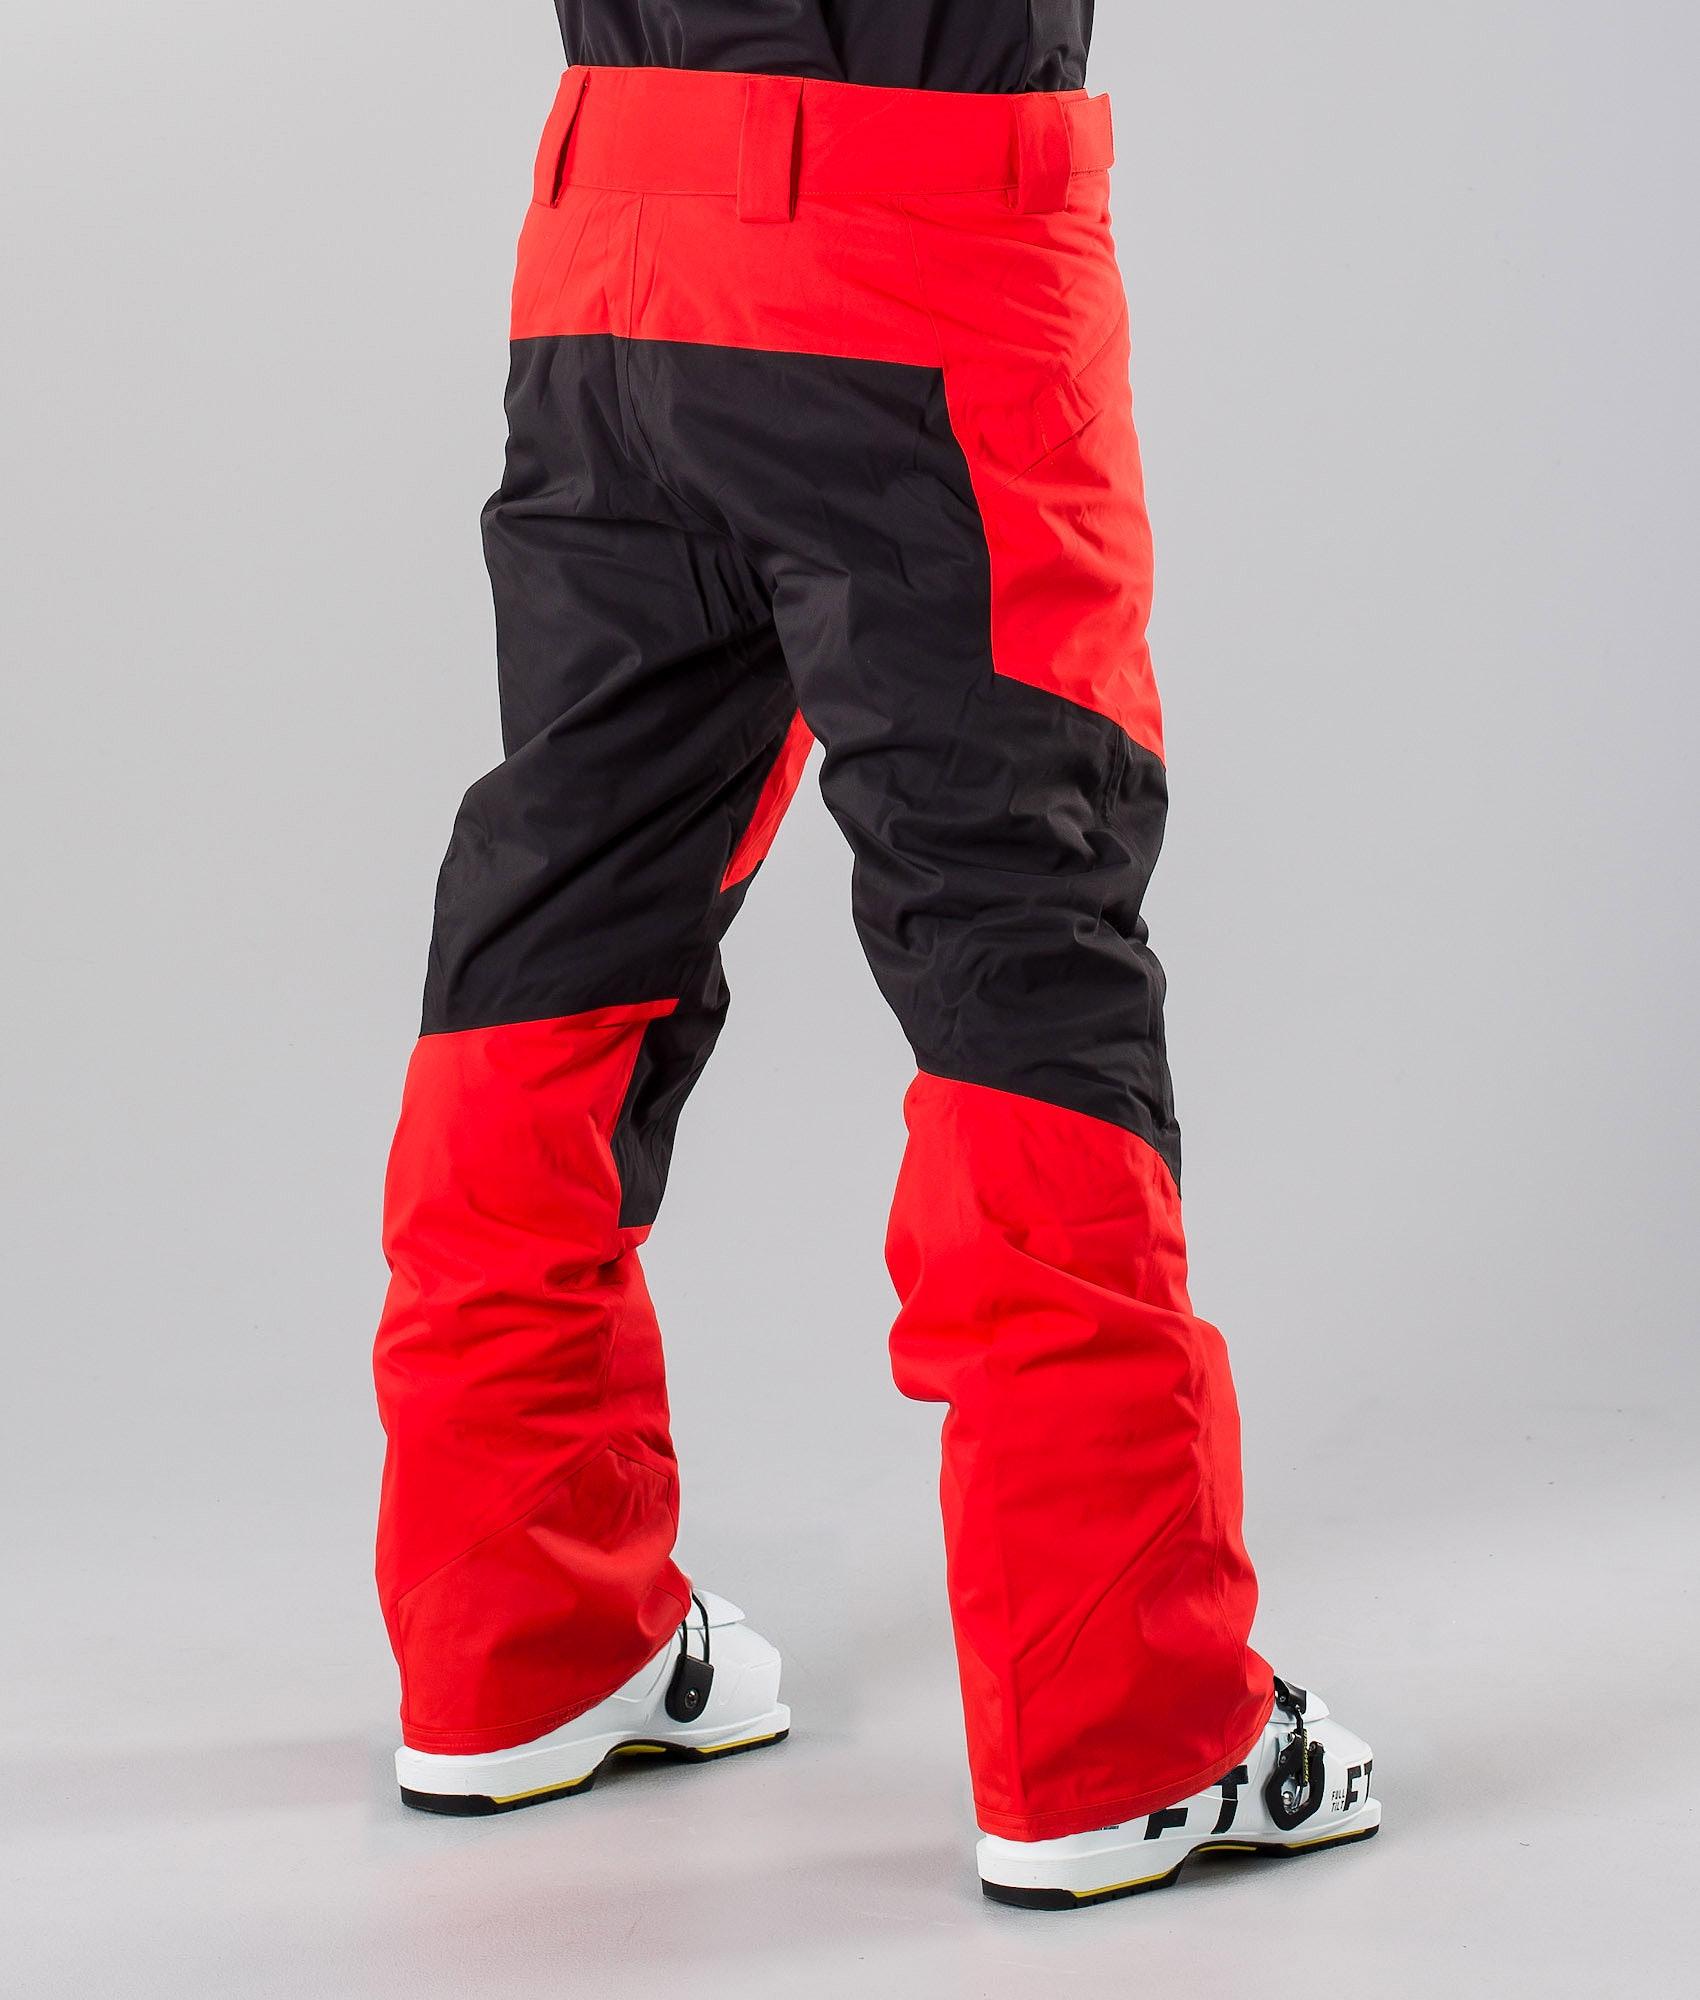 e1fd27d9b8b The North Face Presena Ski Pants Fieryred/Black - Ridestore.com